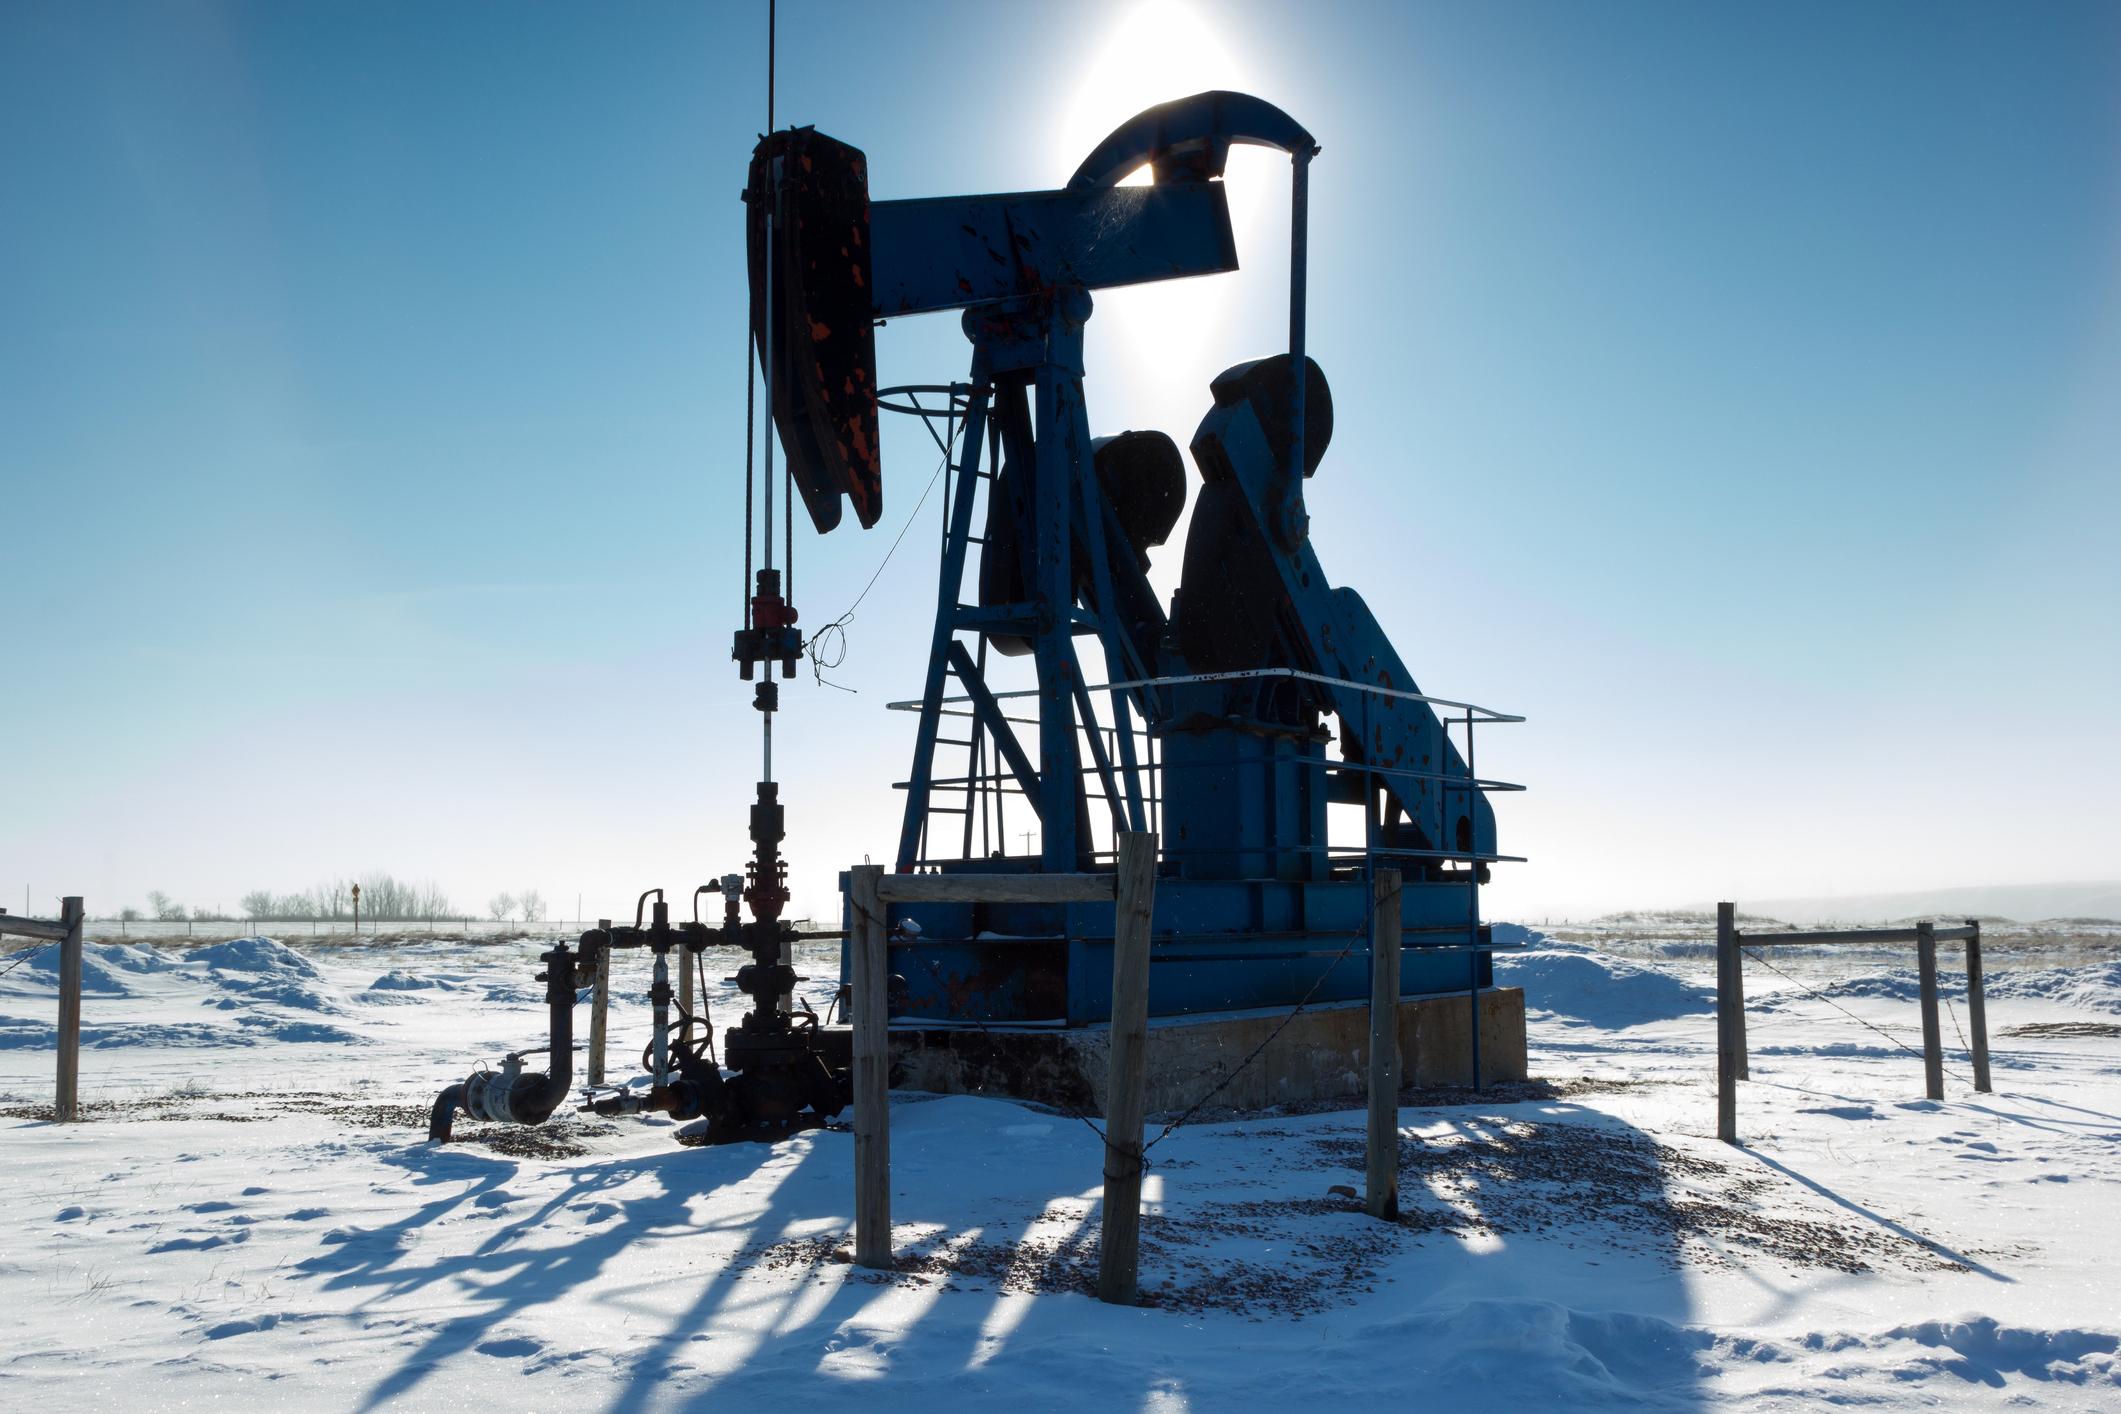 A Backlit Pump Jack in Alberta Canada.